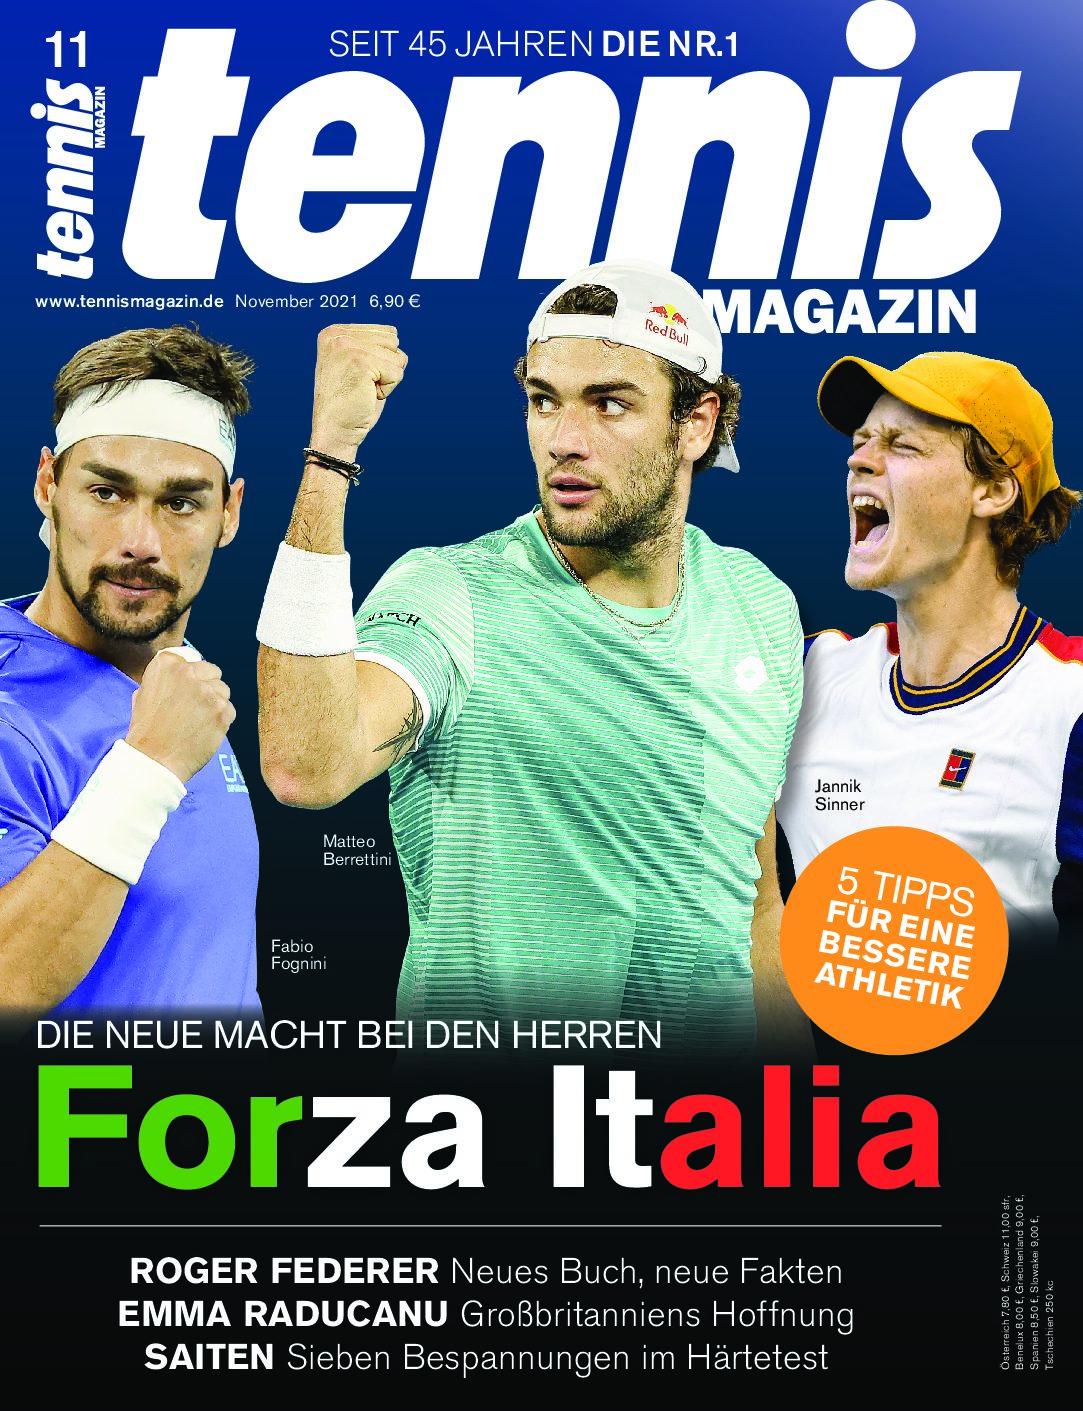 tennis MAGAZIN 11/2021: Forza Italia